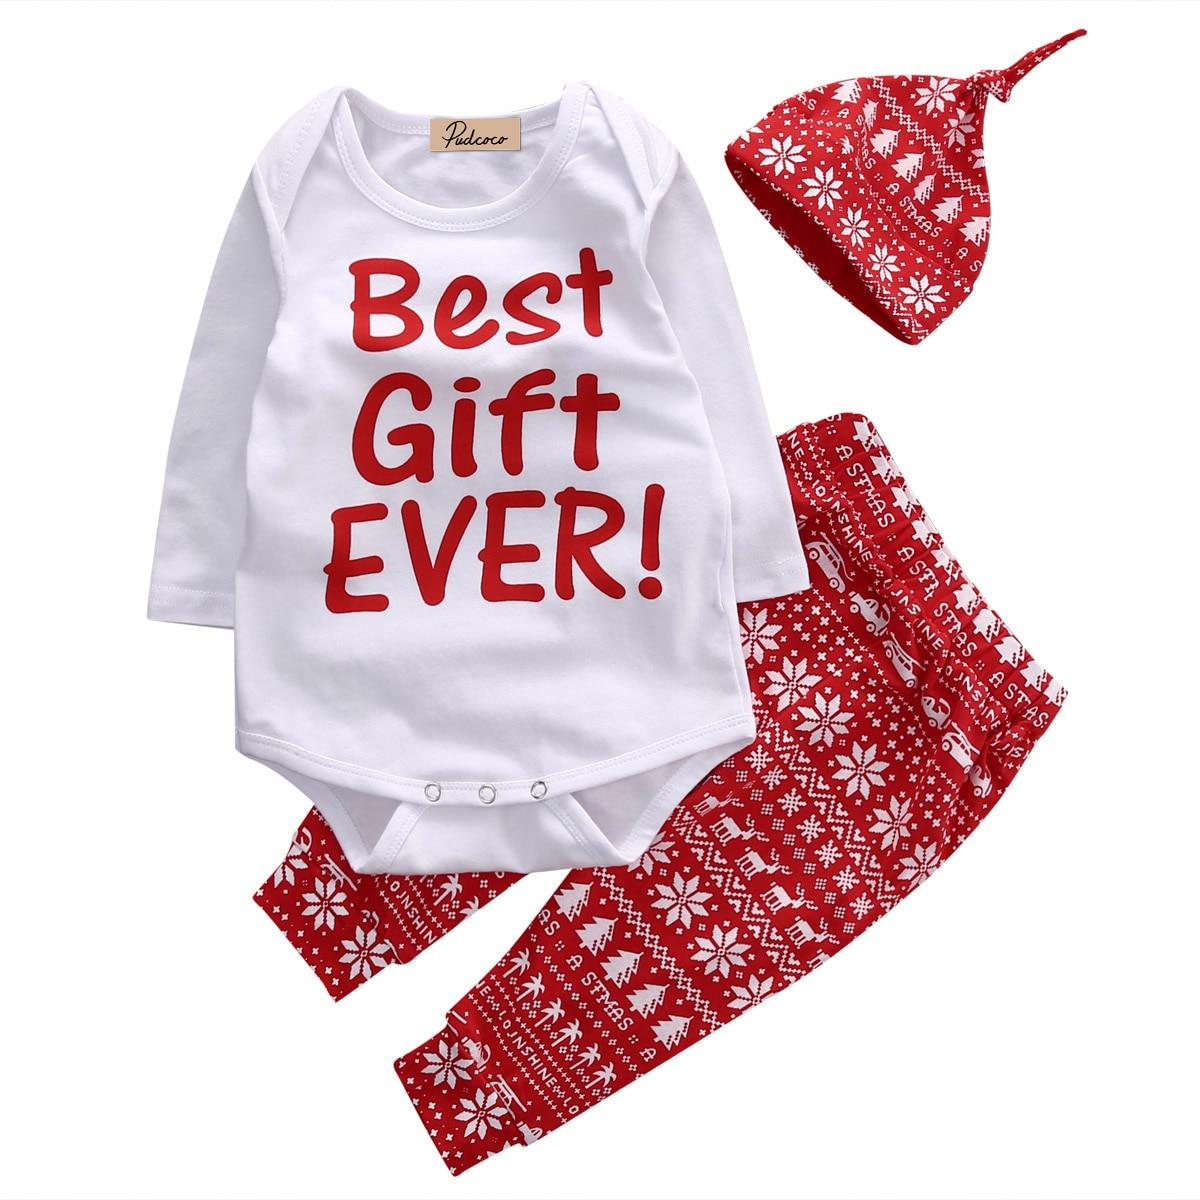 Xmas 2017 Best Gift Newborn Baby Boys Girls Cotton Romper+Pants Legging Hat Outfits Set